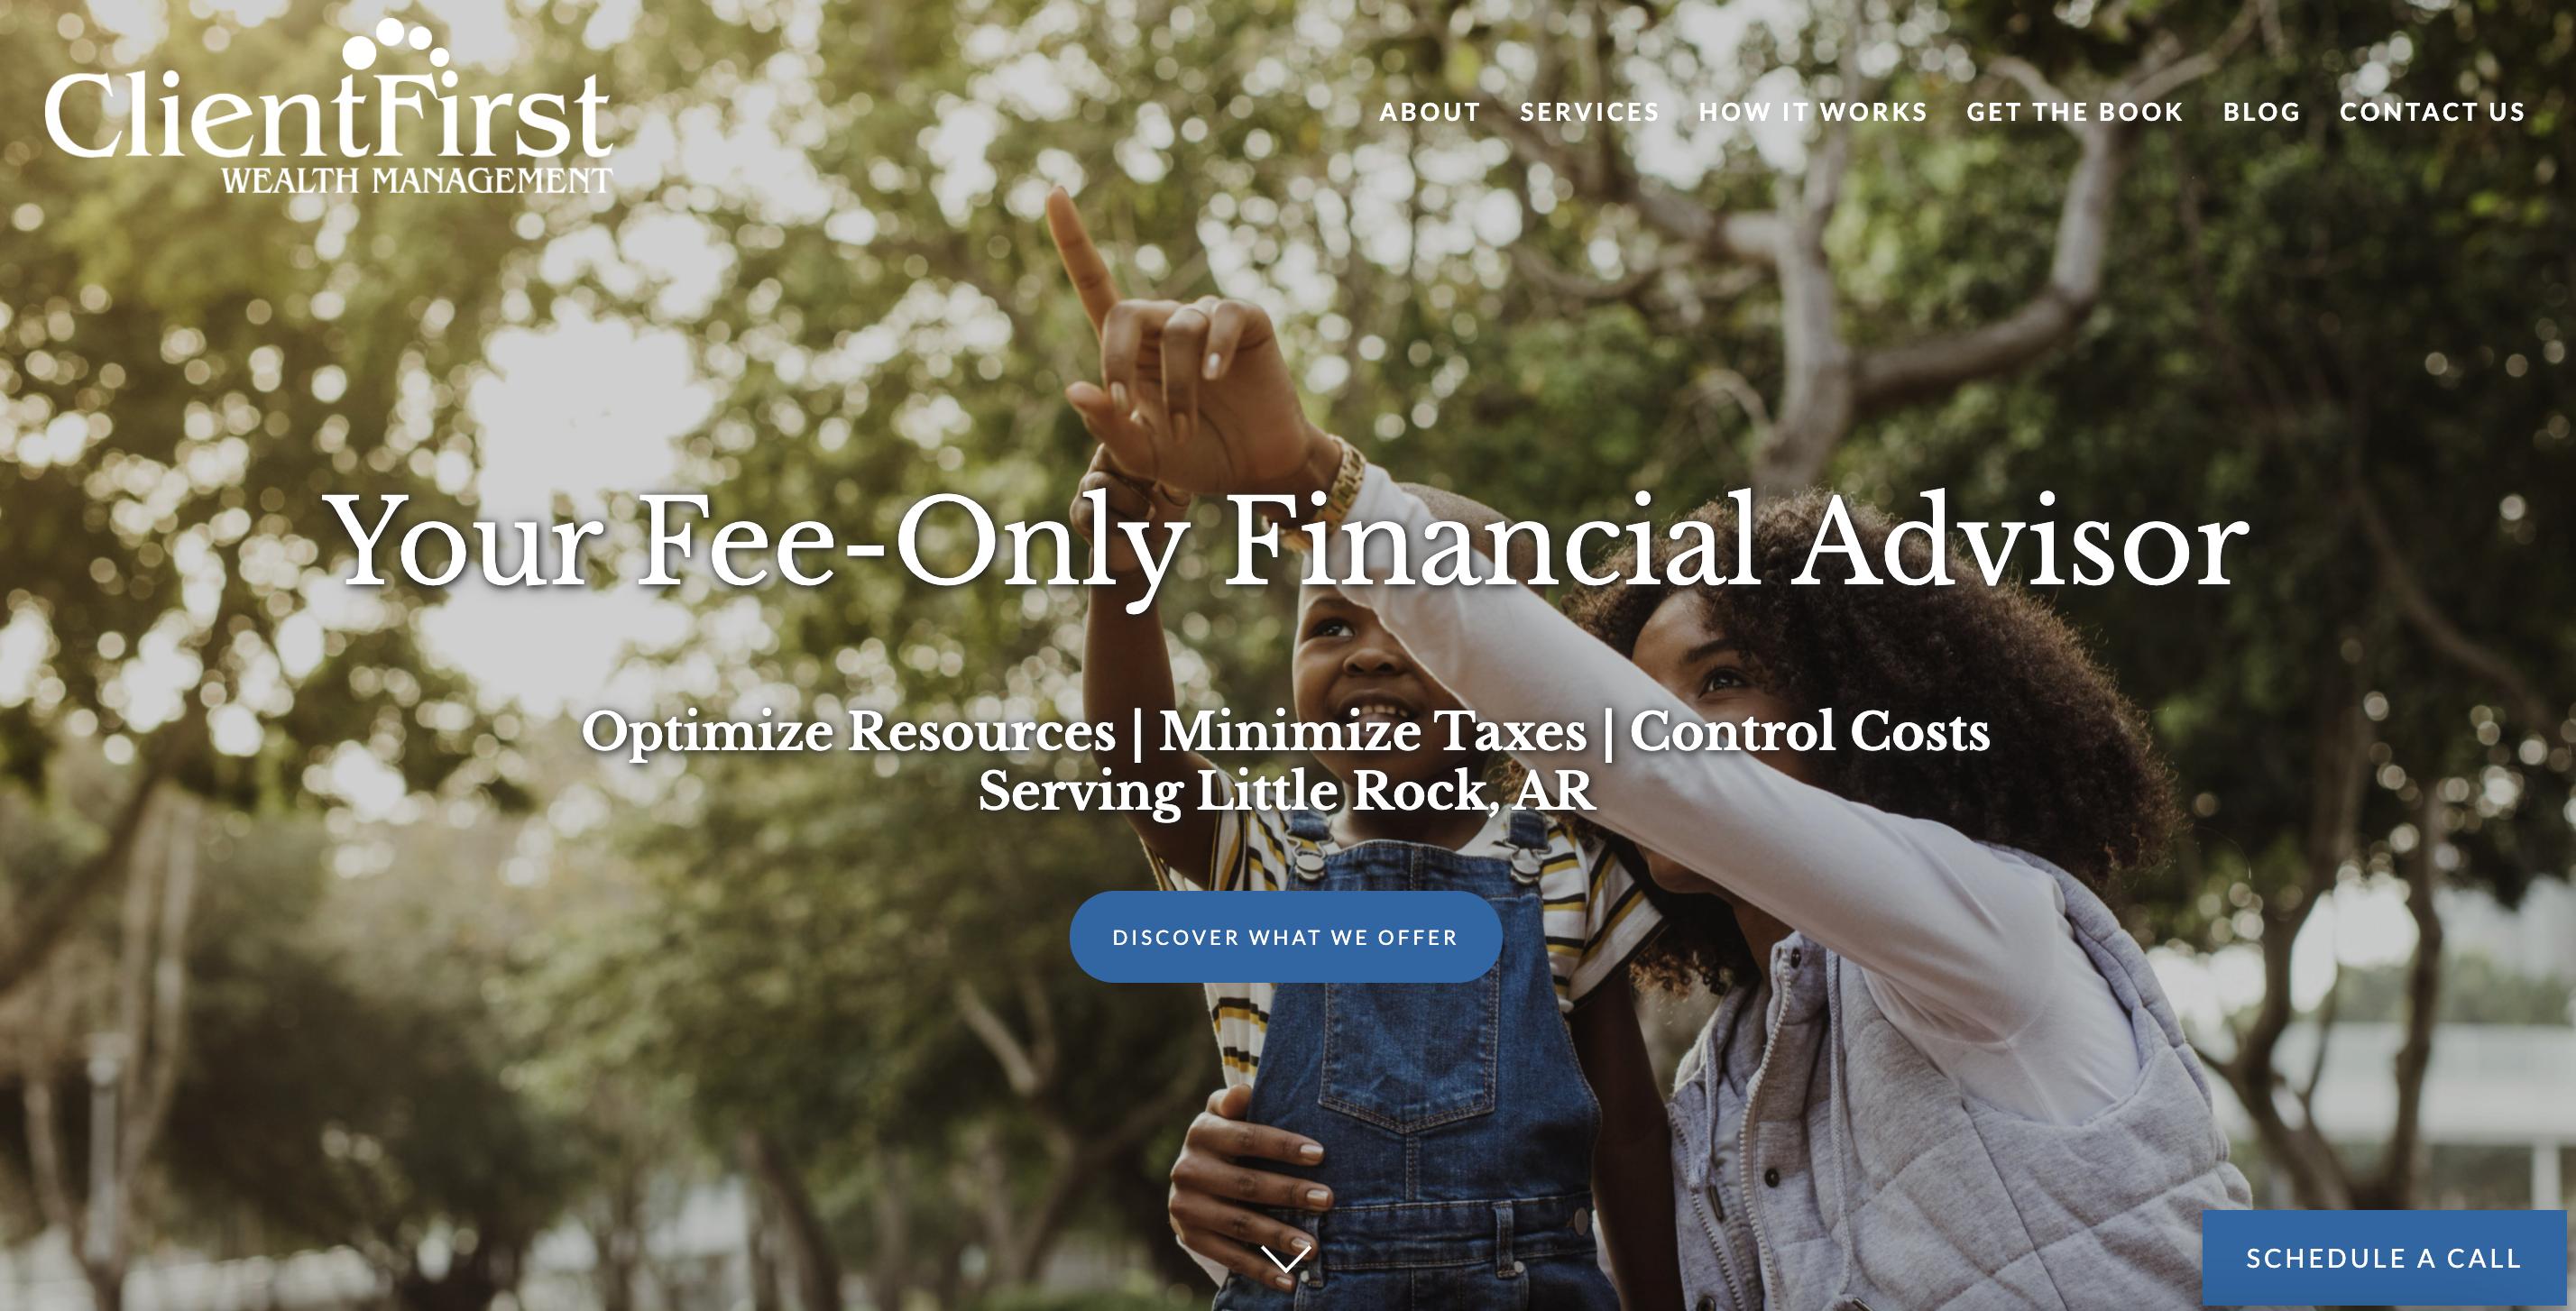 Client First Wealth Management CTA